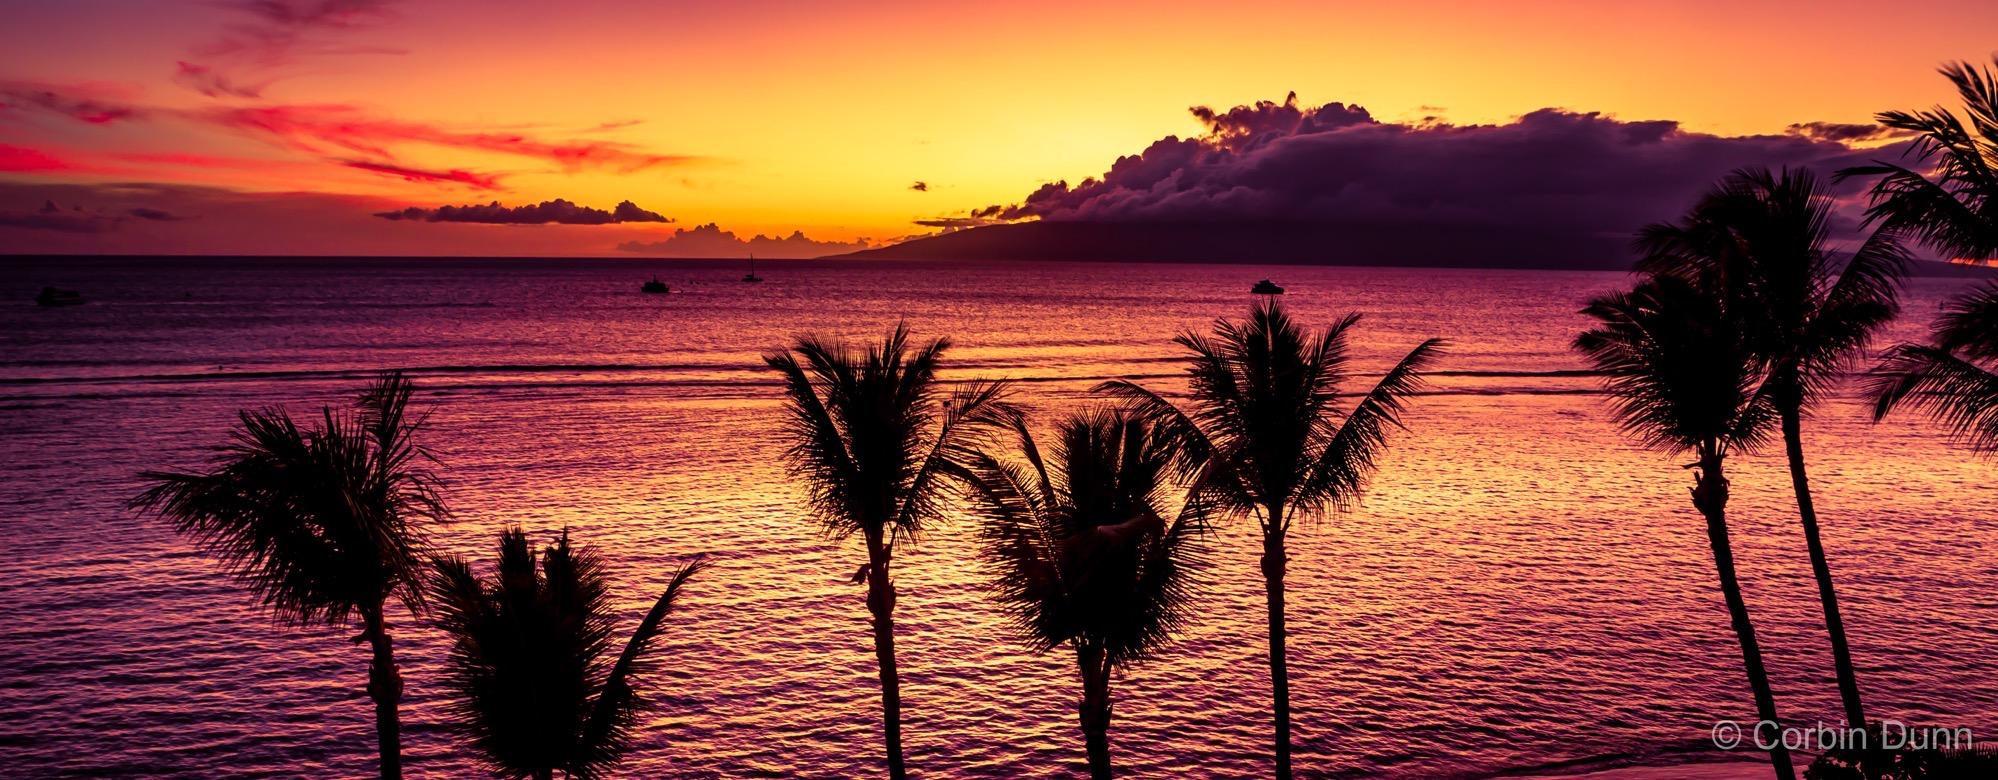 Palm Tree Pano  UW1A6163